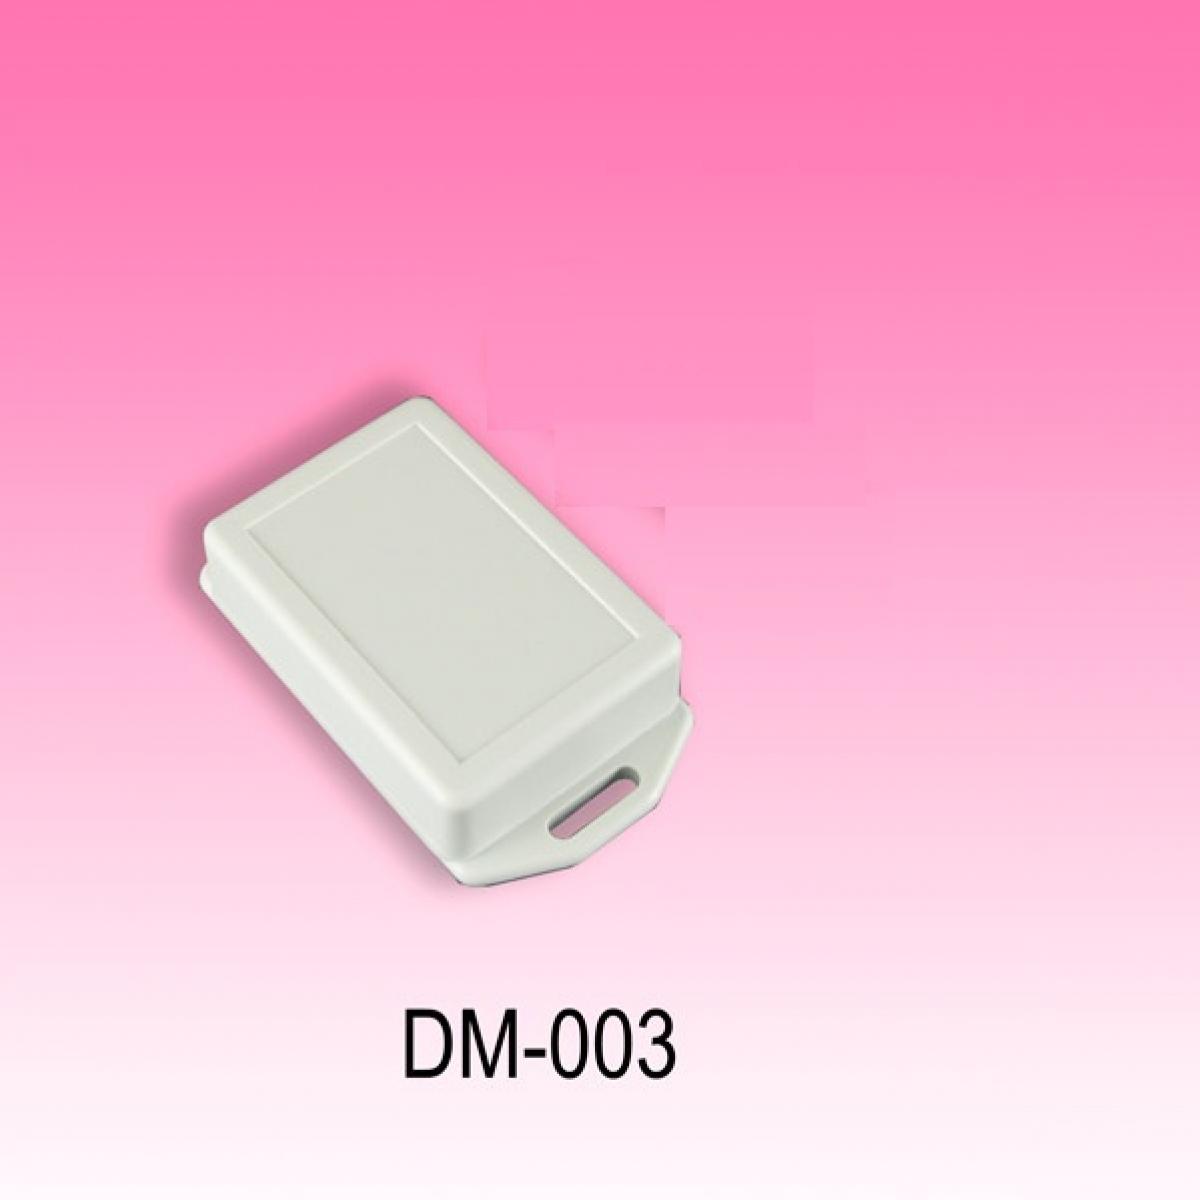 DM-003